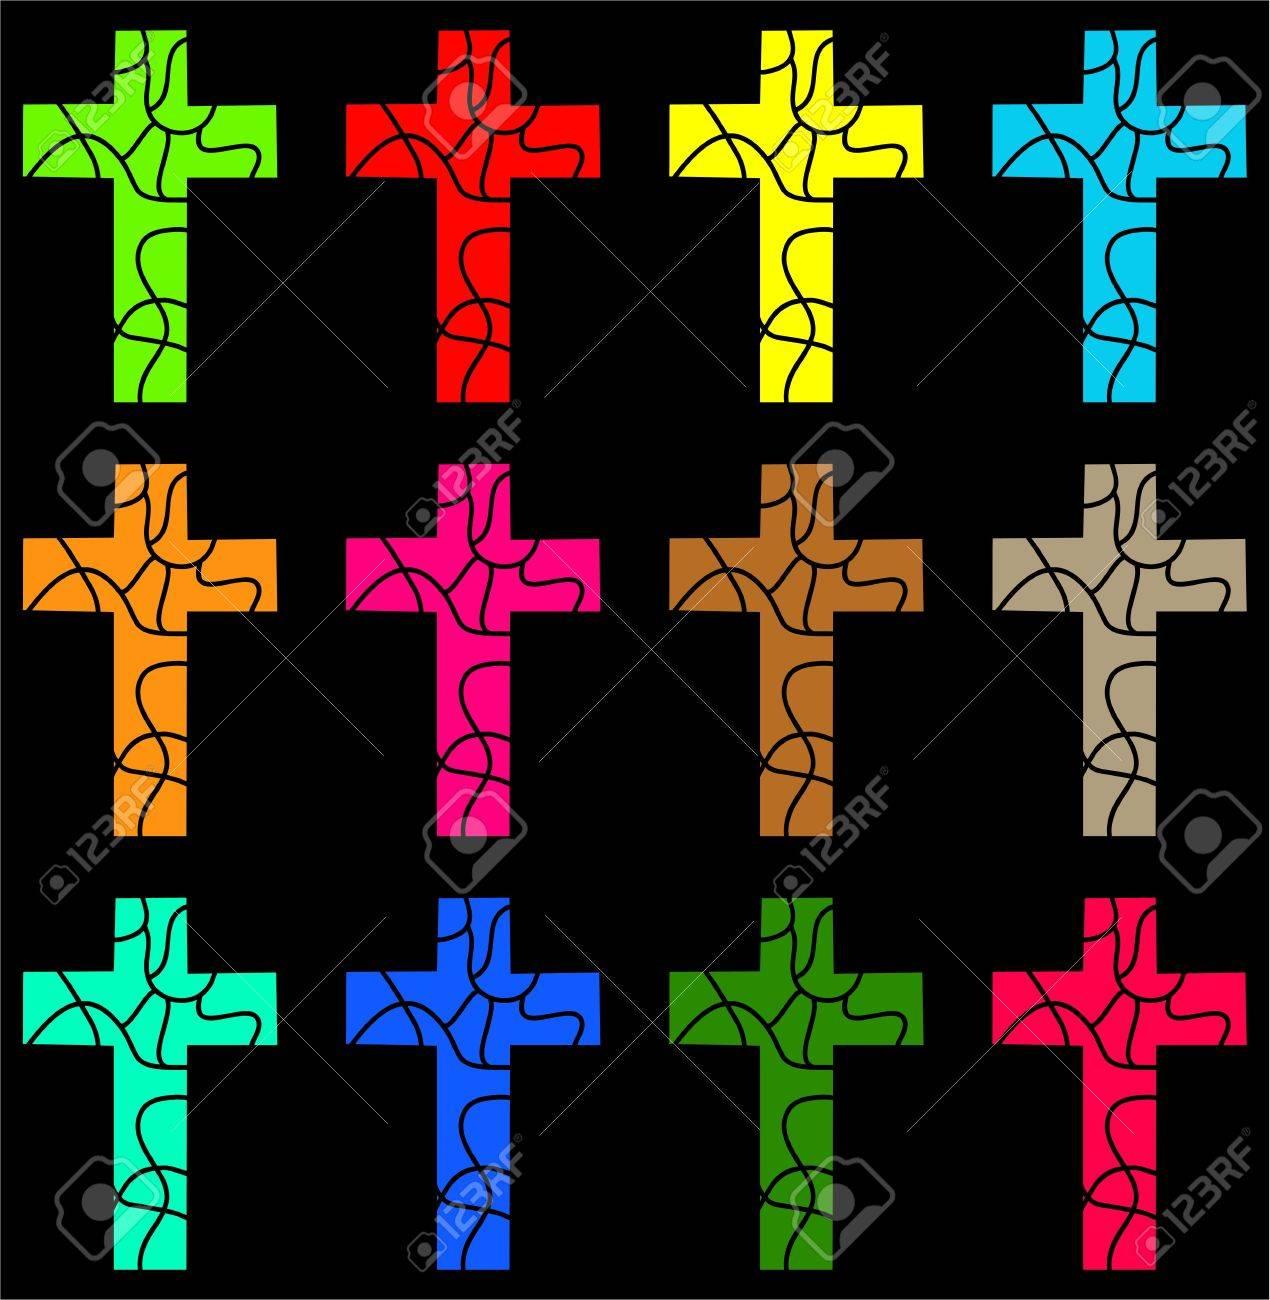 Christian Cross Pattern colourful Christian cross